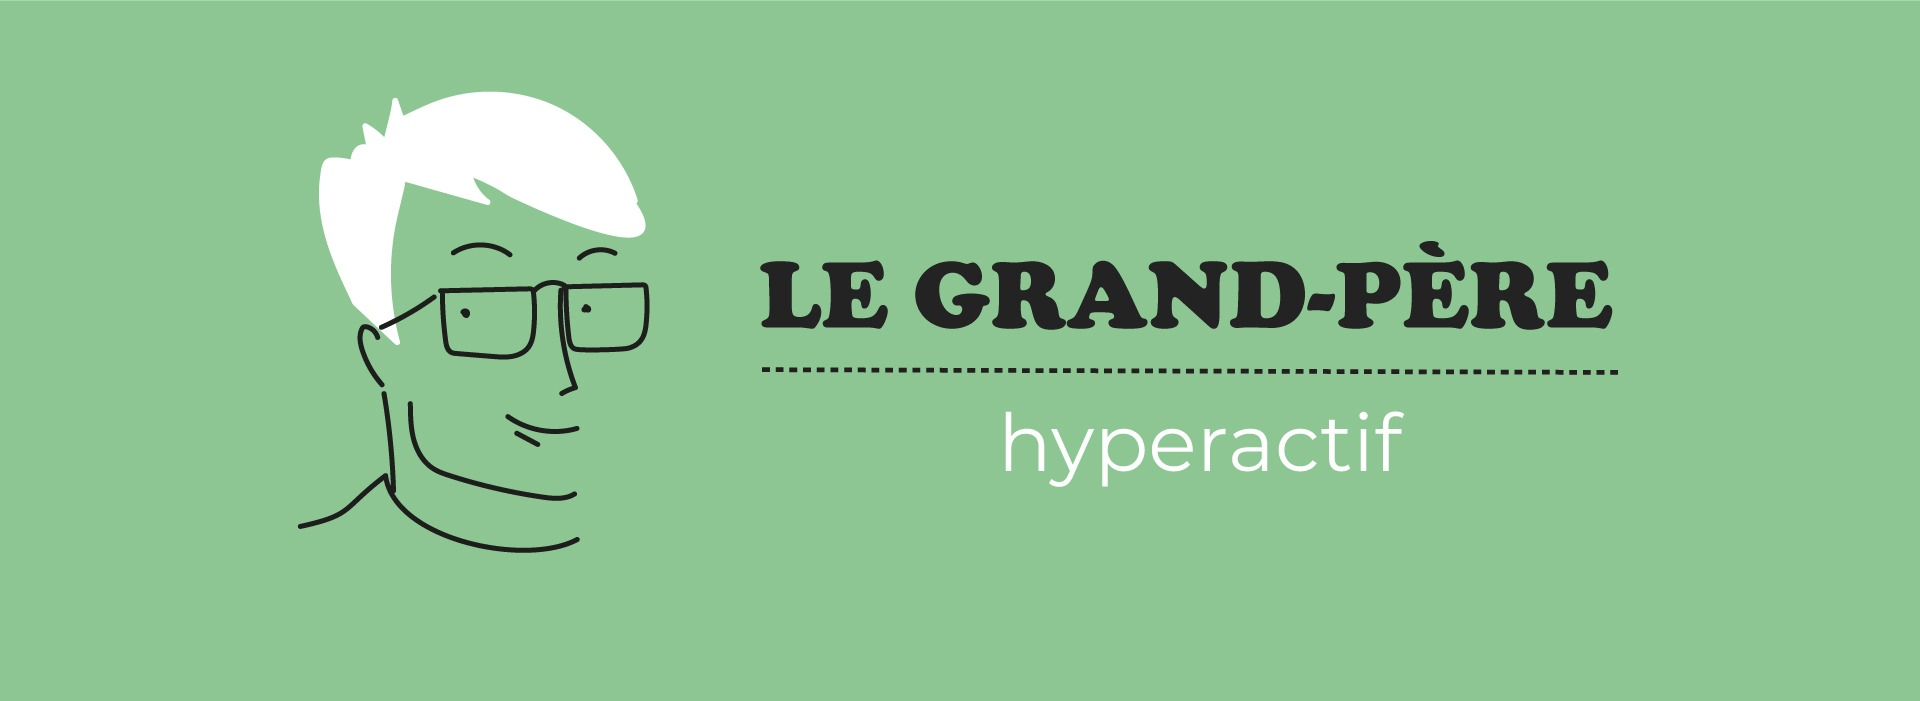 Grand-Père hyperactif